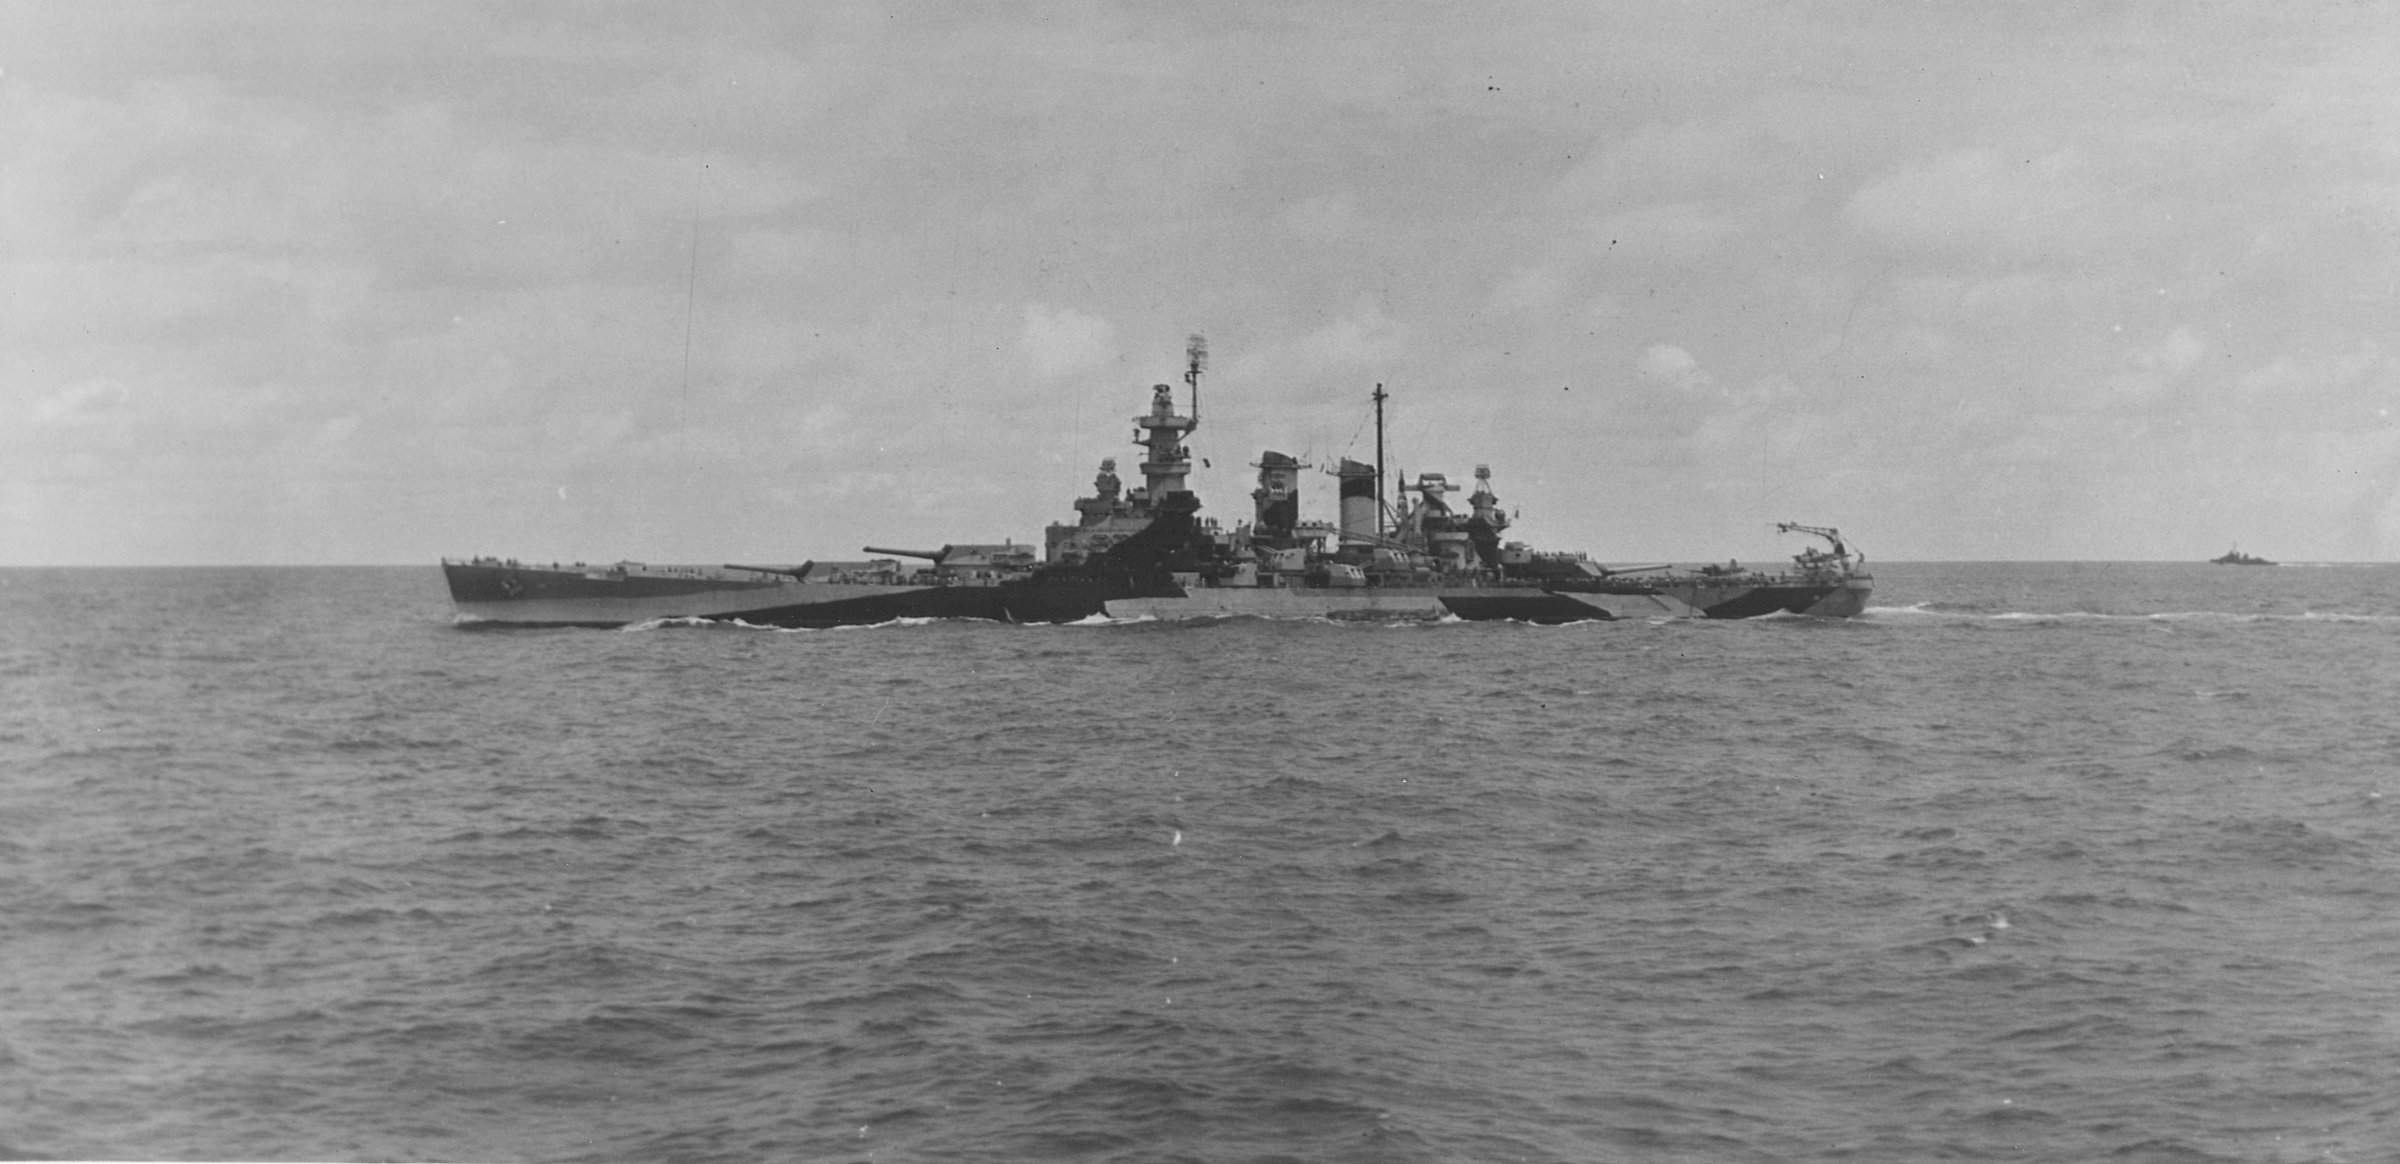 USS_North_Carolina_(BB-55)_during_Marshall_islands_campaign,_25_January_1944.jpg